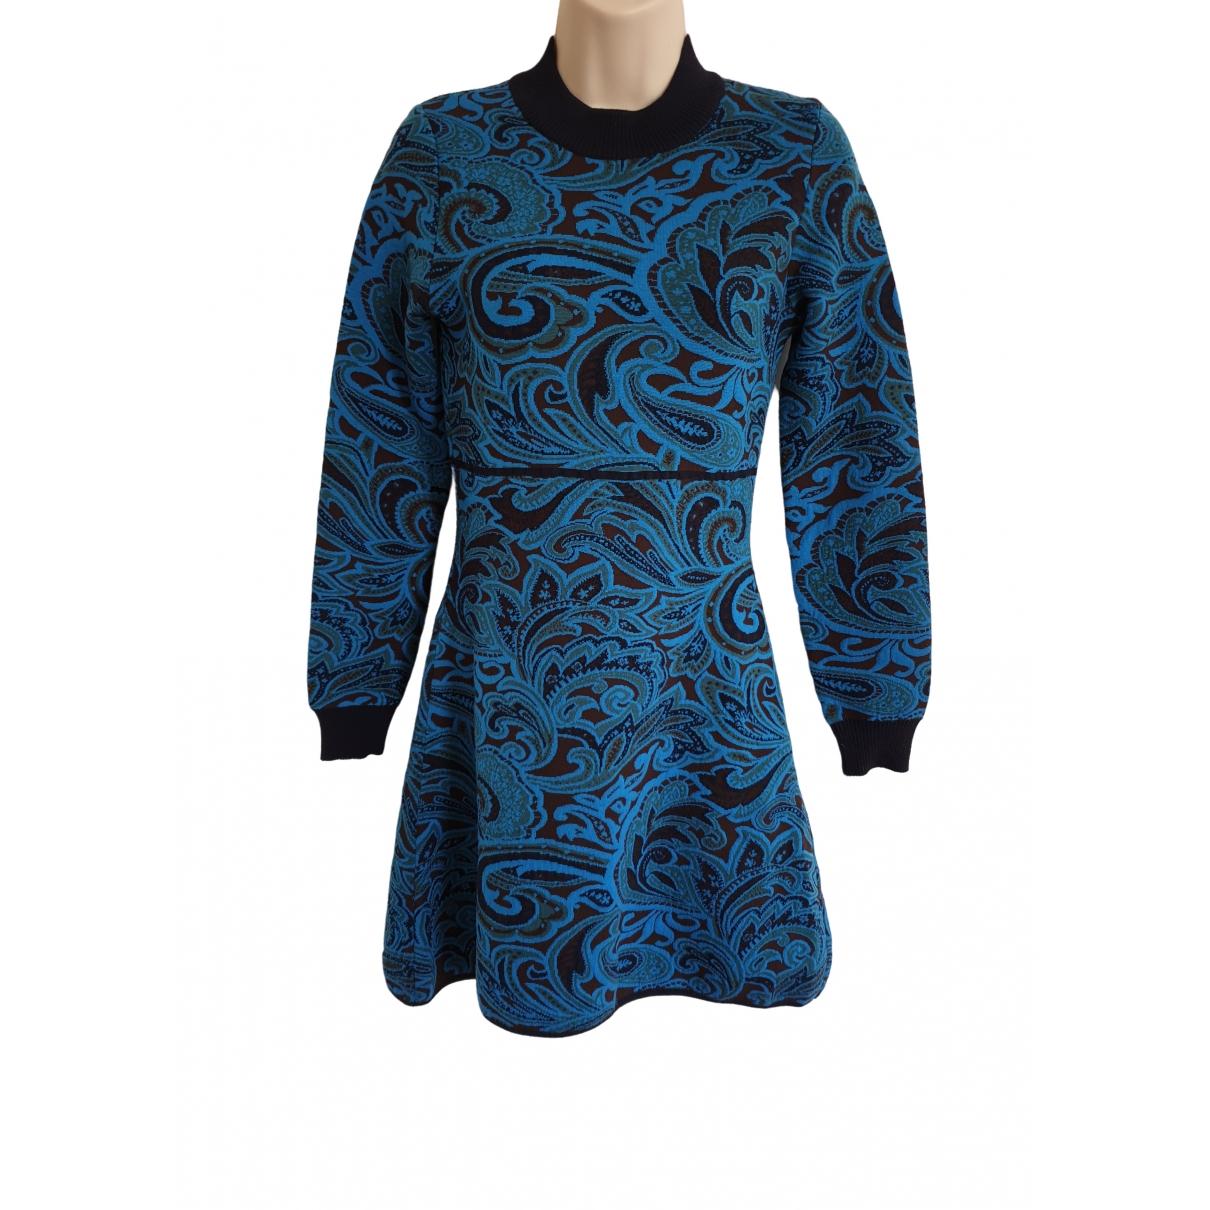 Mary Katrantzou \N Blue dress for Women S International